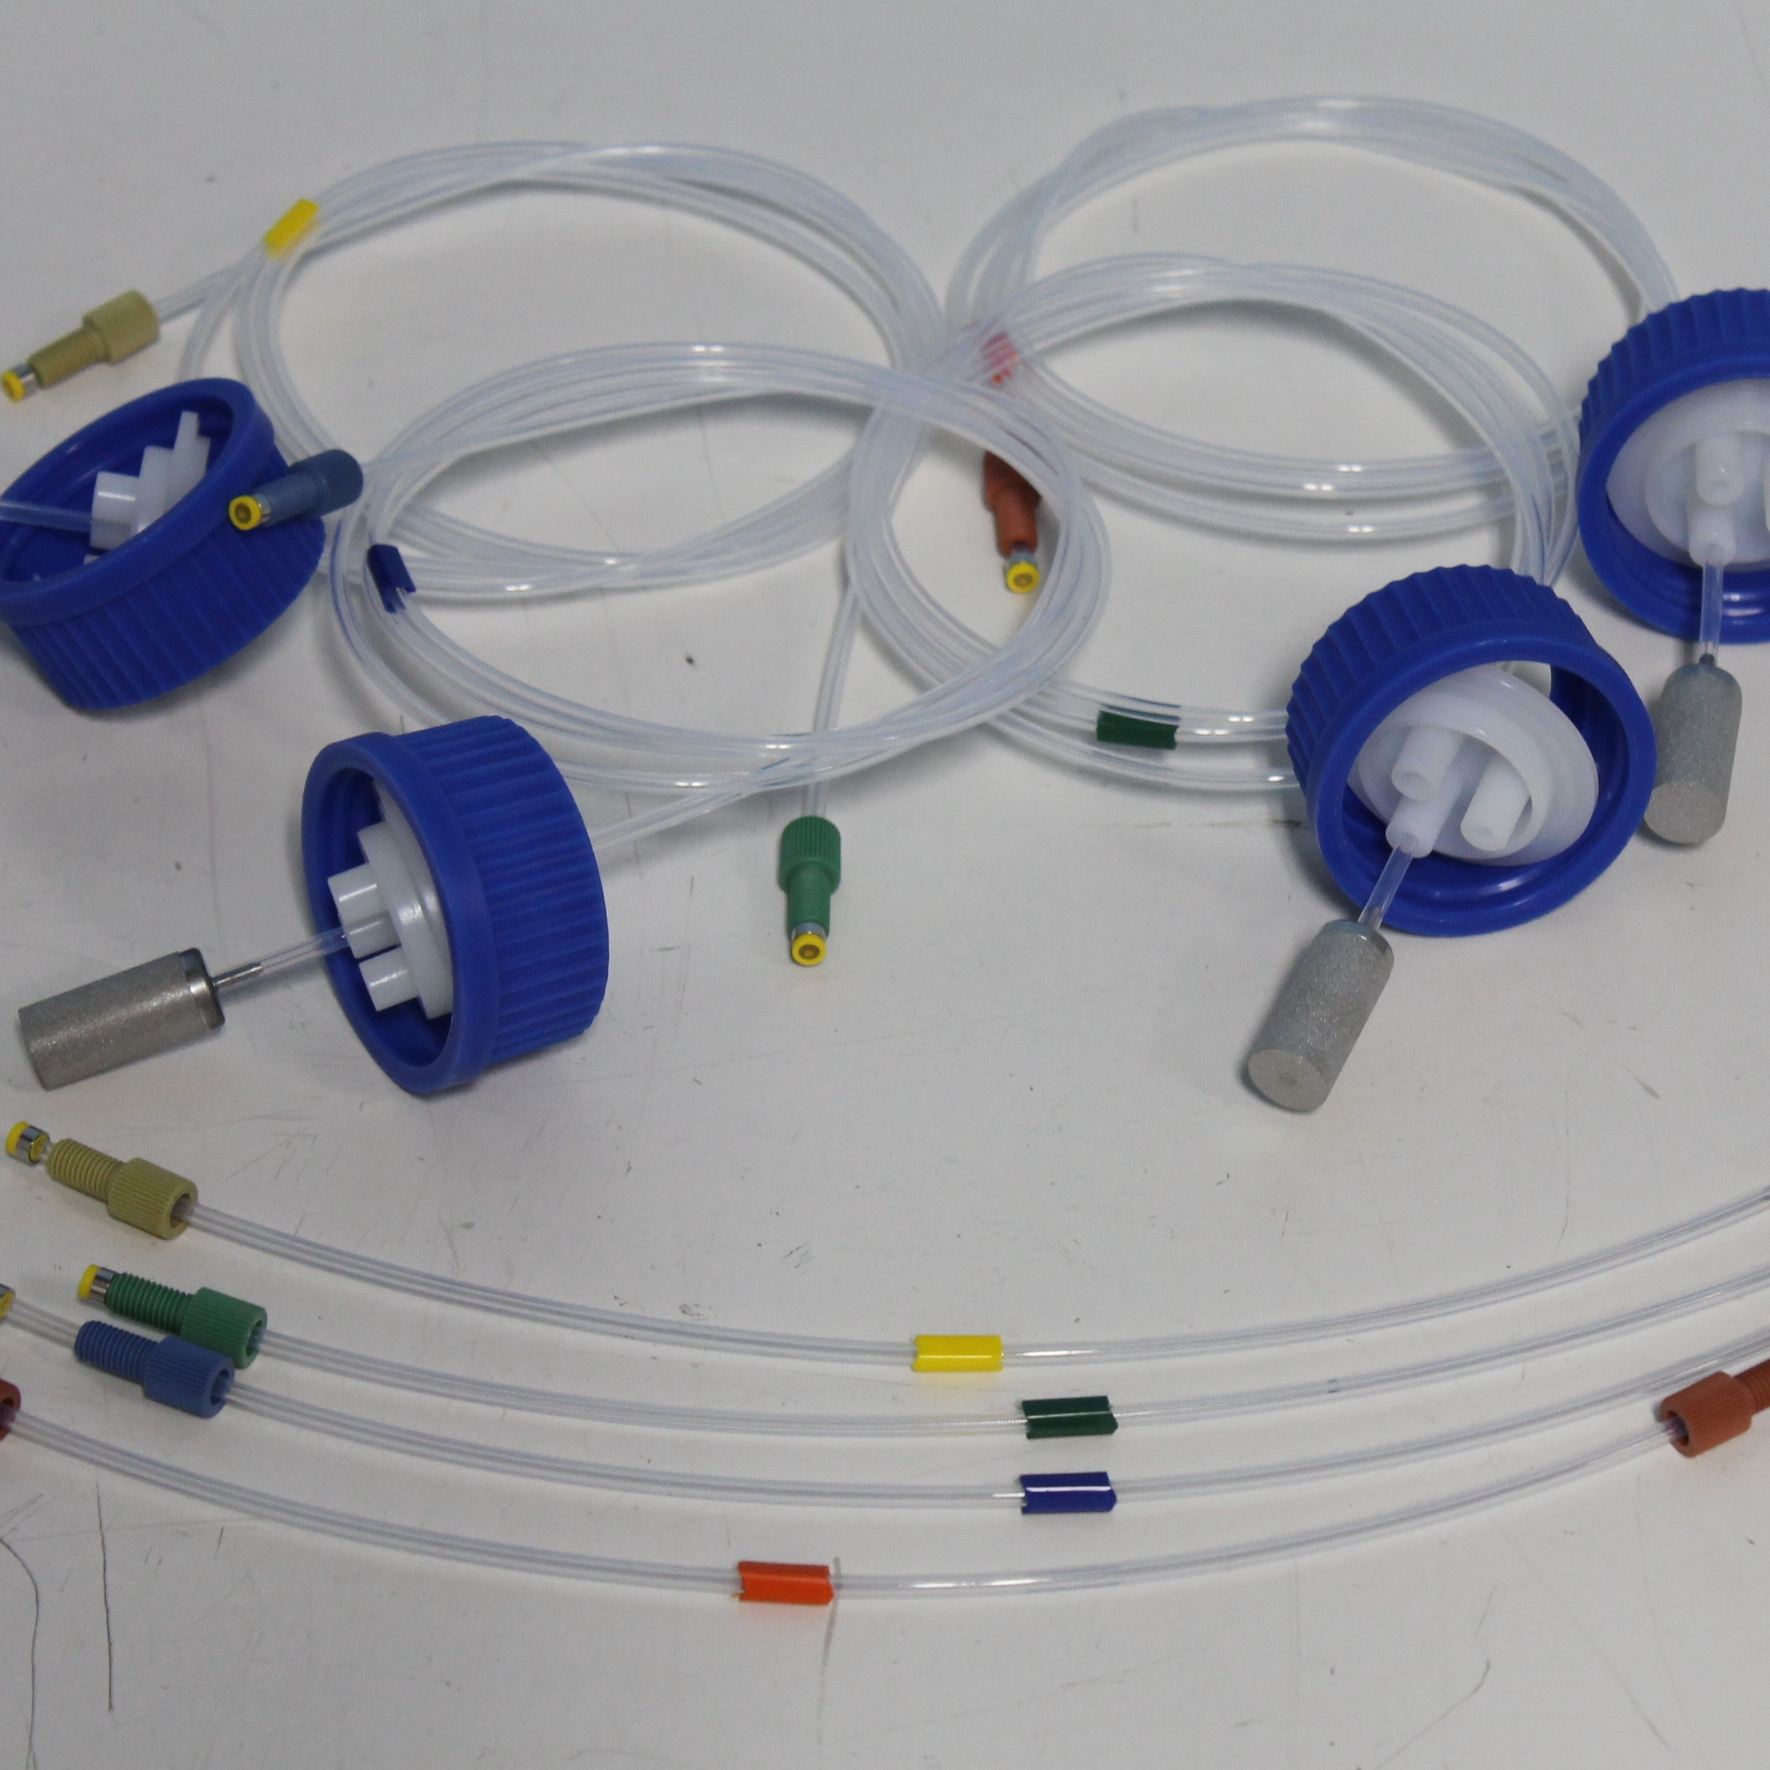 Agilent 1100/1200 Series Tubing Kit Image